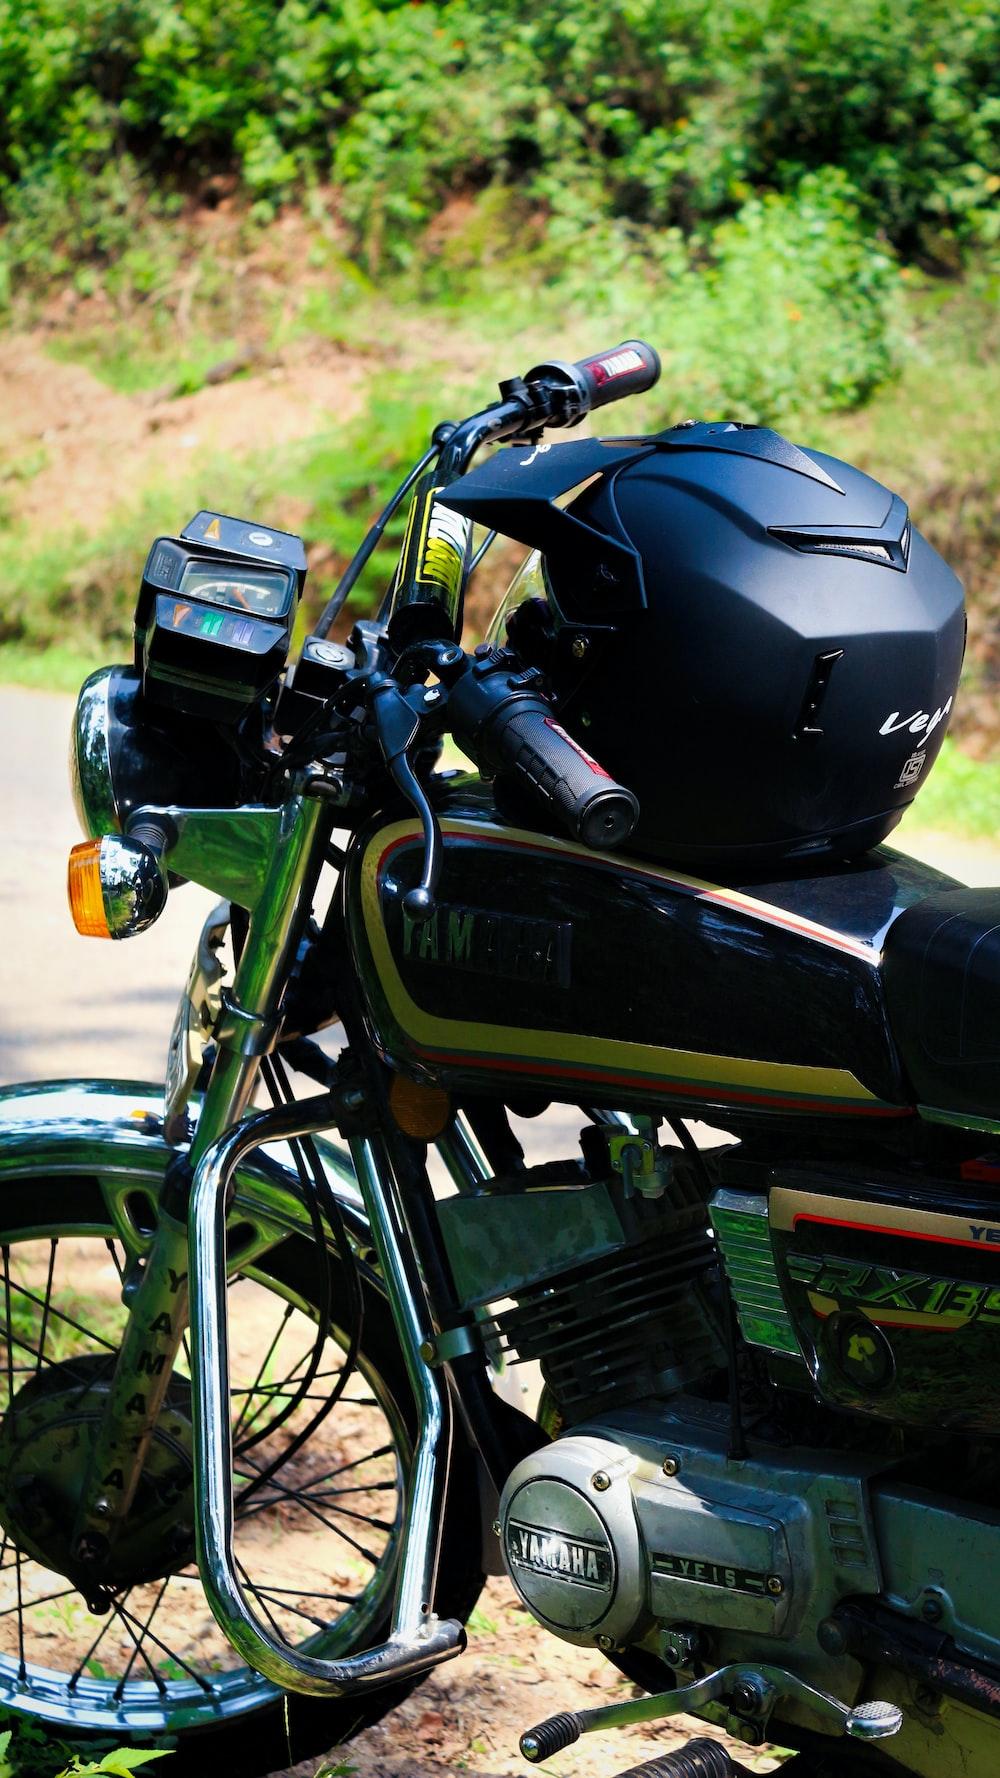 bike photo editor app download apk